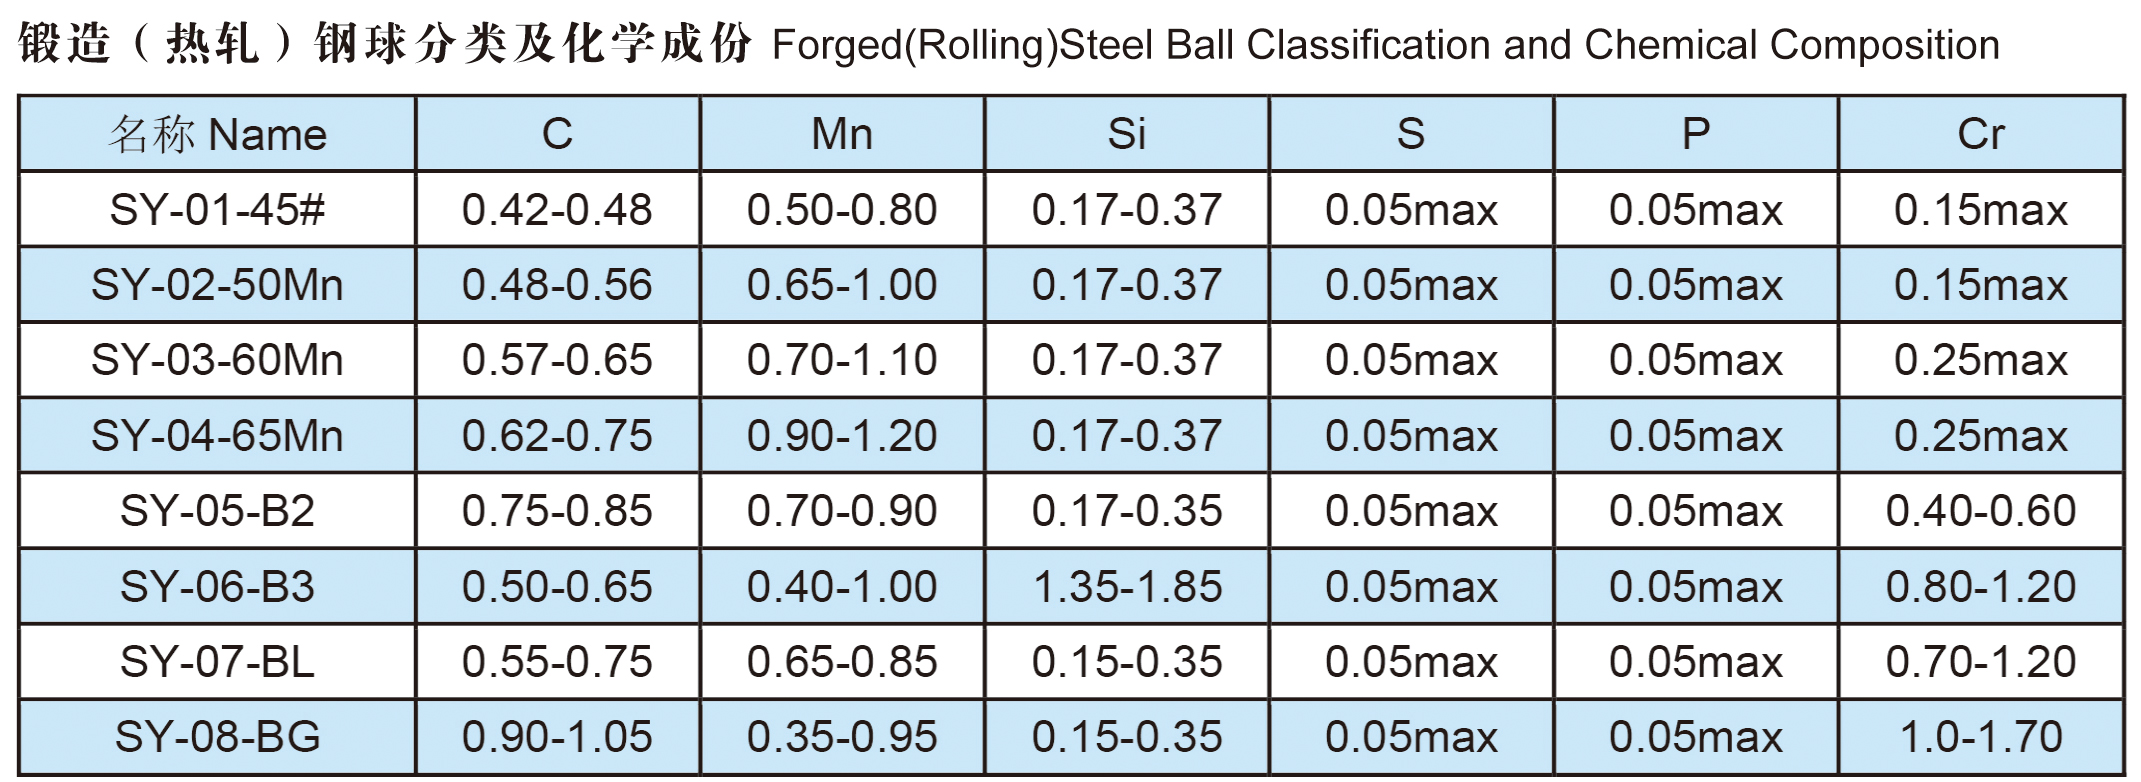 Steel Ball Hardeness